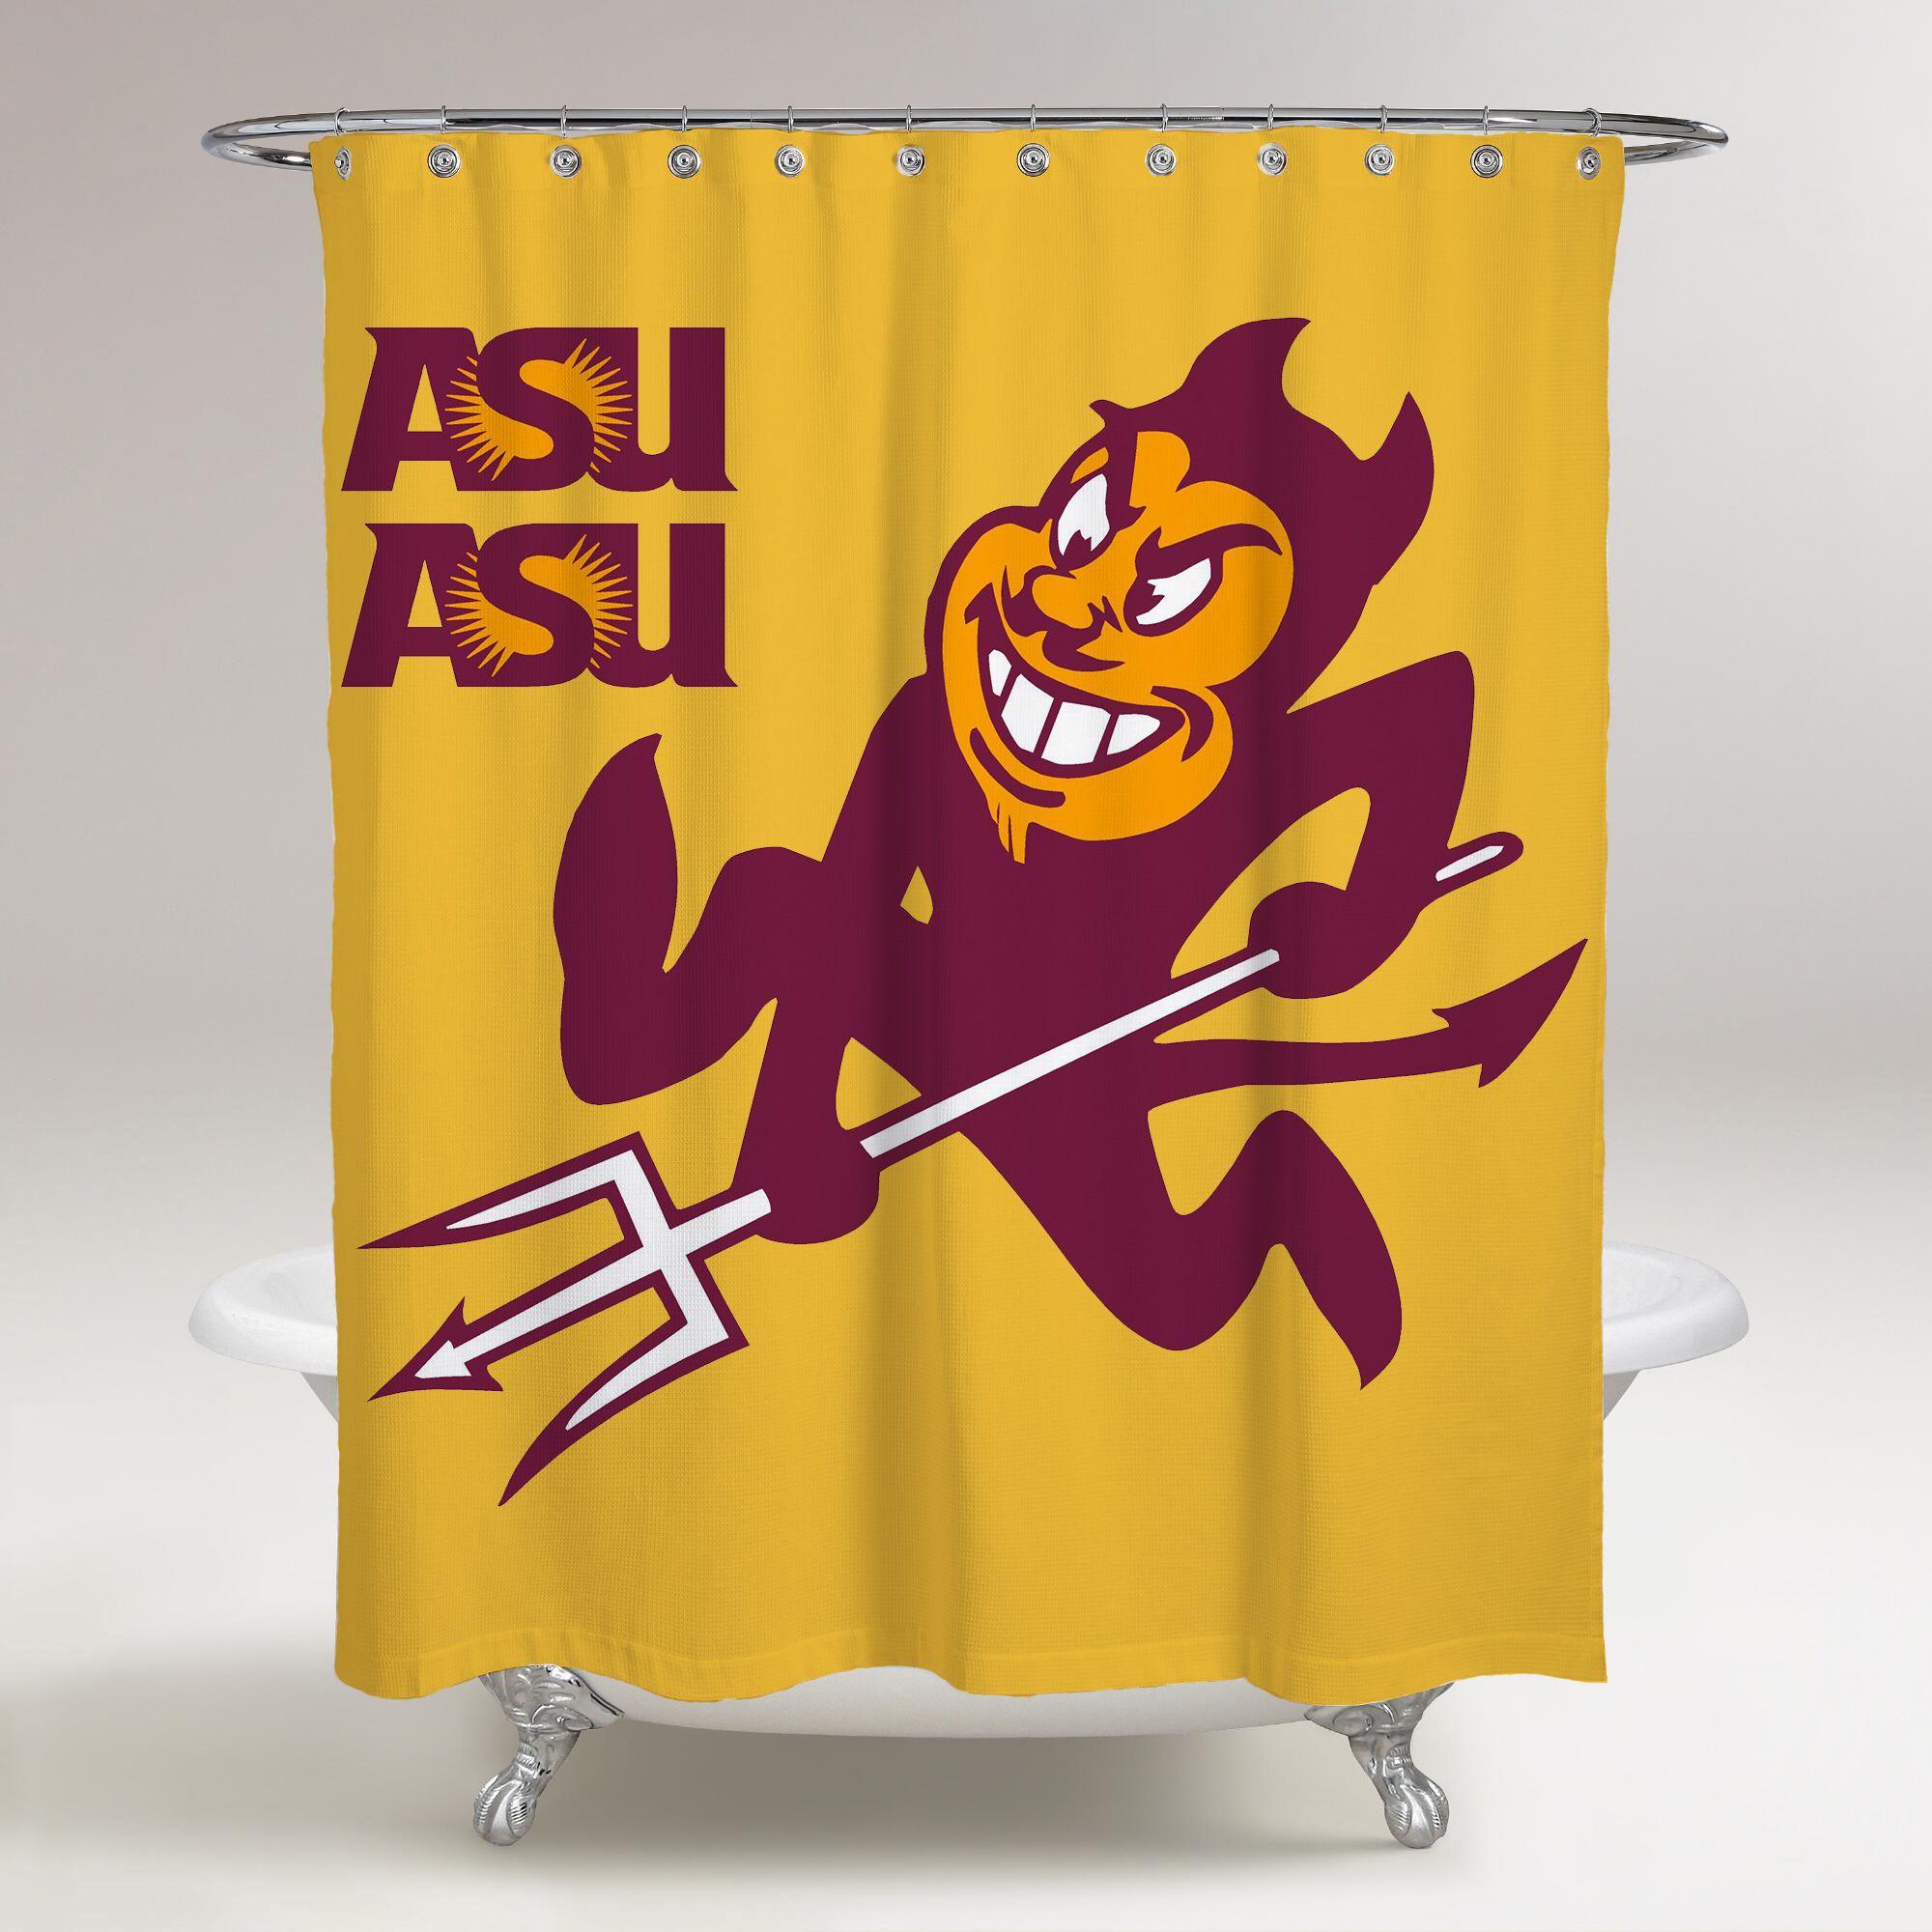 Arizona State Sun Devils Logo Assu Yellow Background Printed